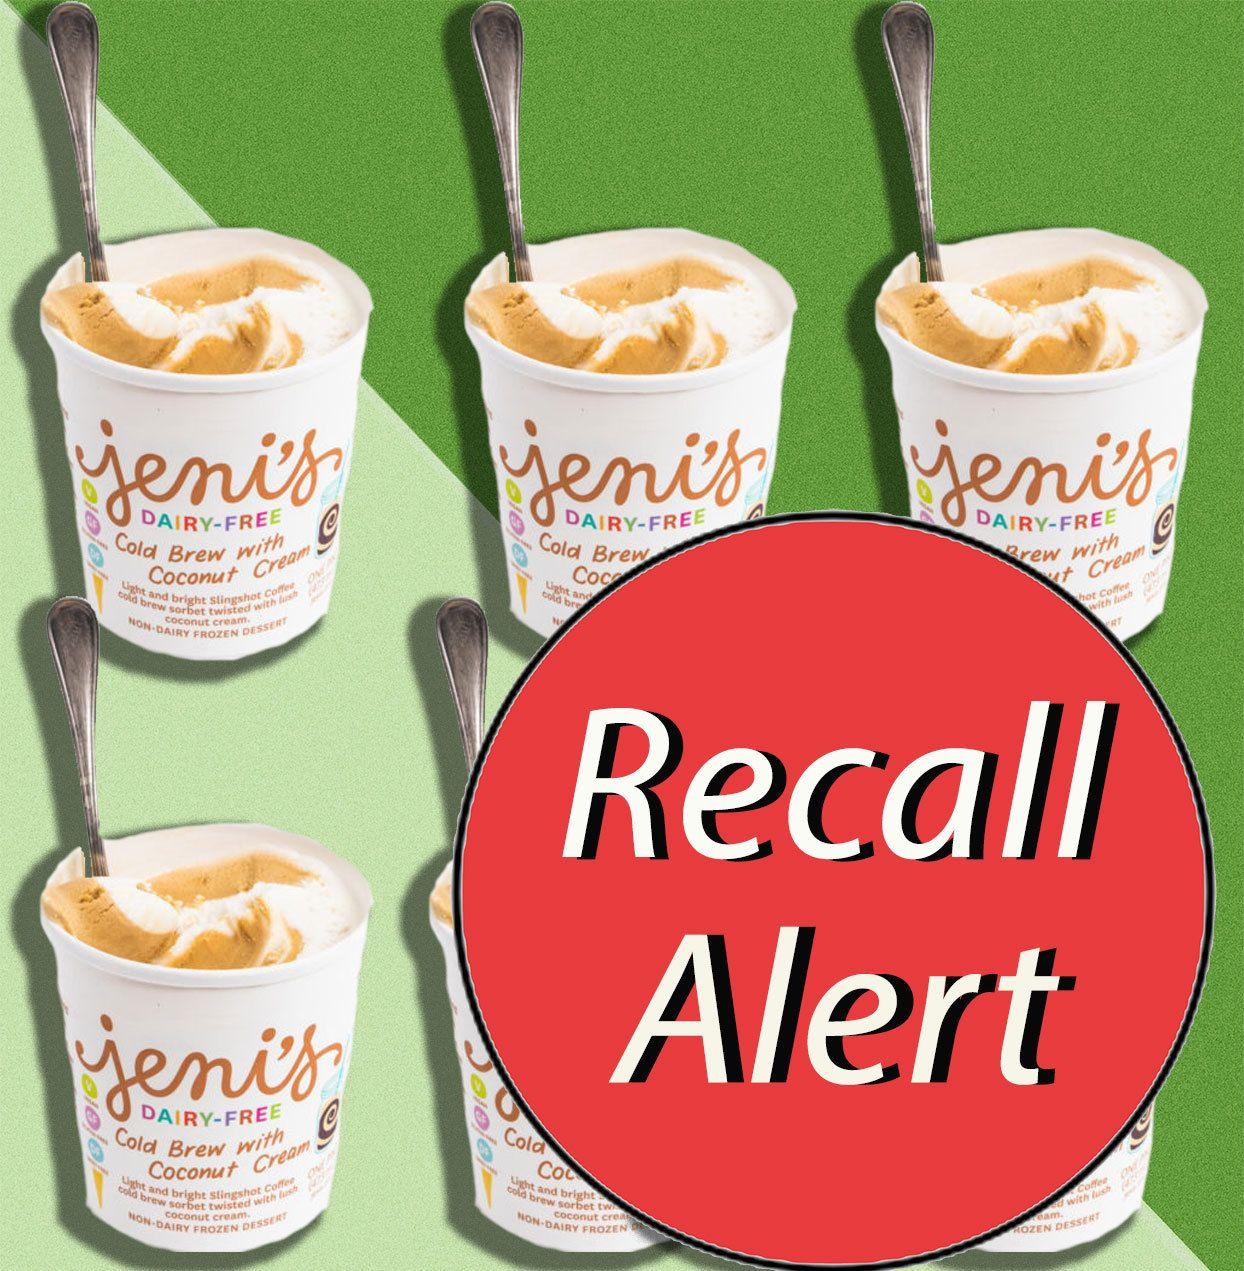 Jeni S Vegan Ice Cream Recalled For Potentially Containing Dairy In 2020 Vegan Ice Cream Ice Cream Companies Whole Foods Market